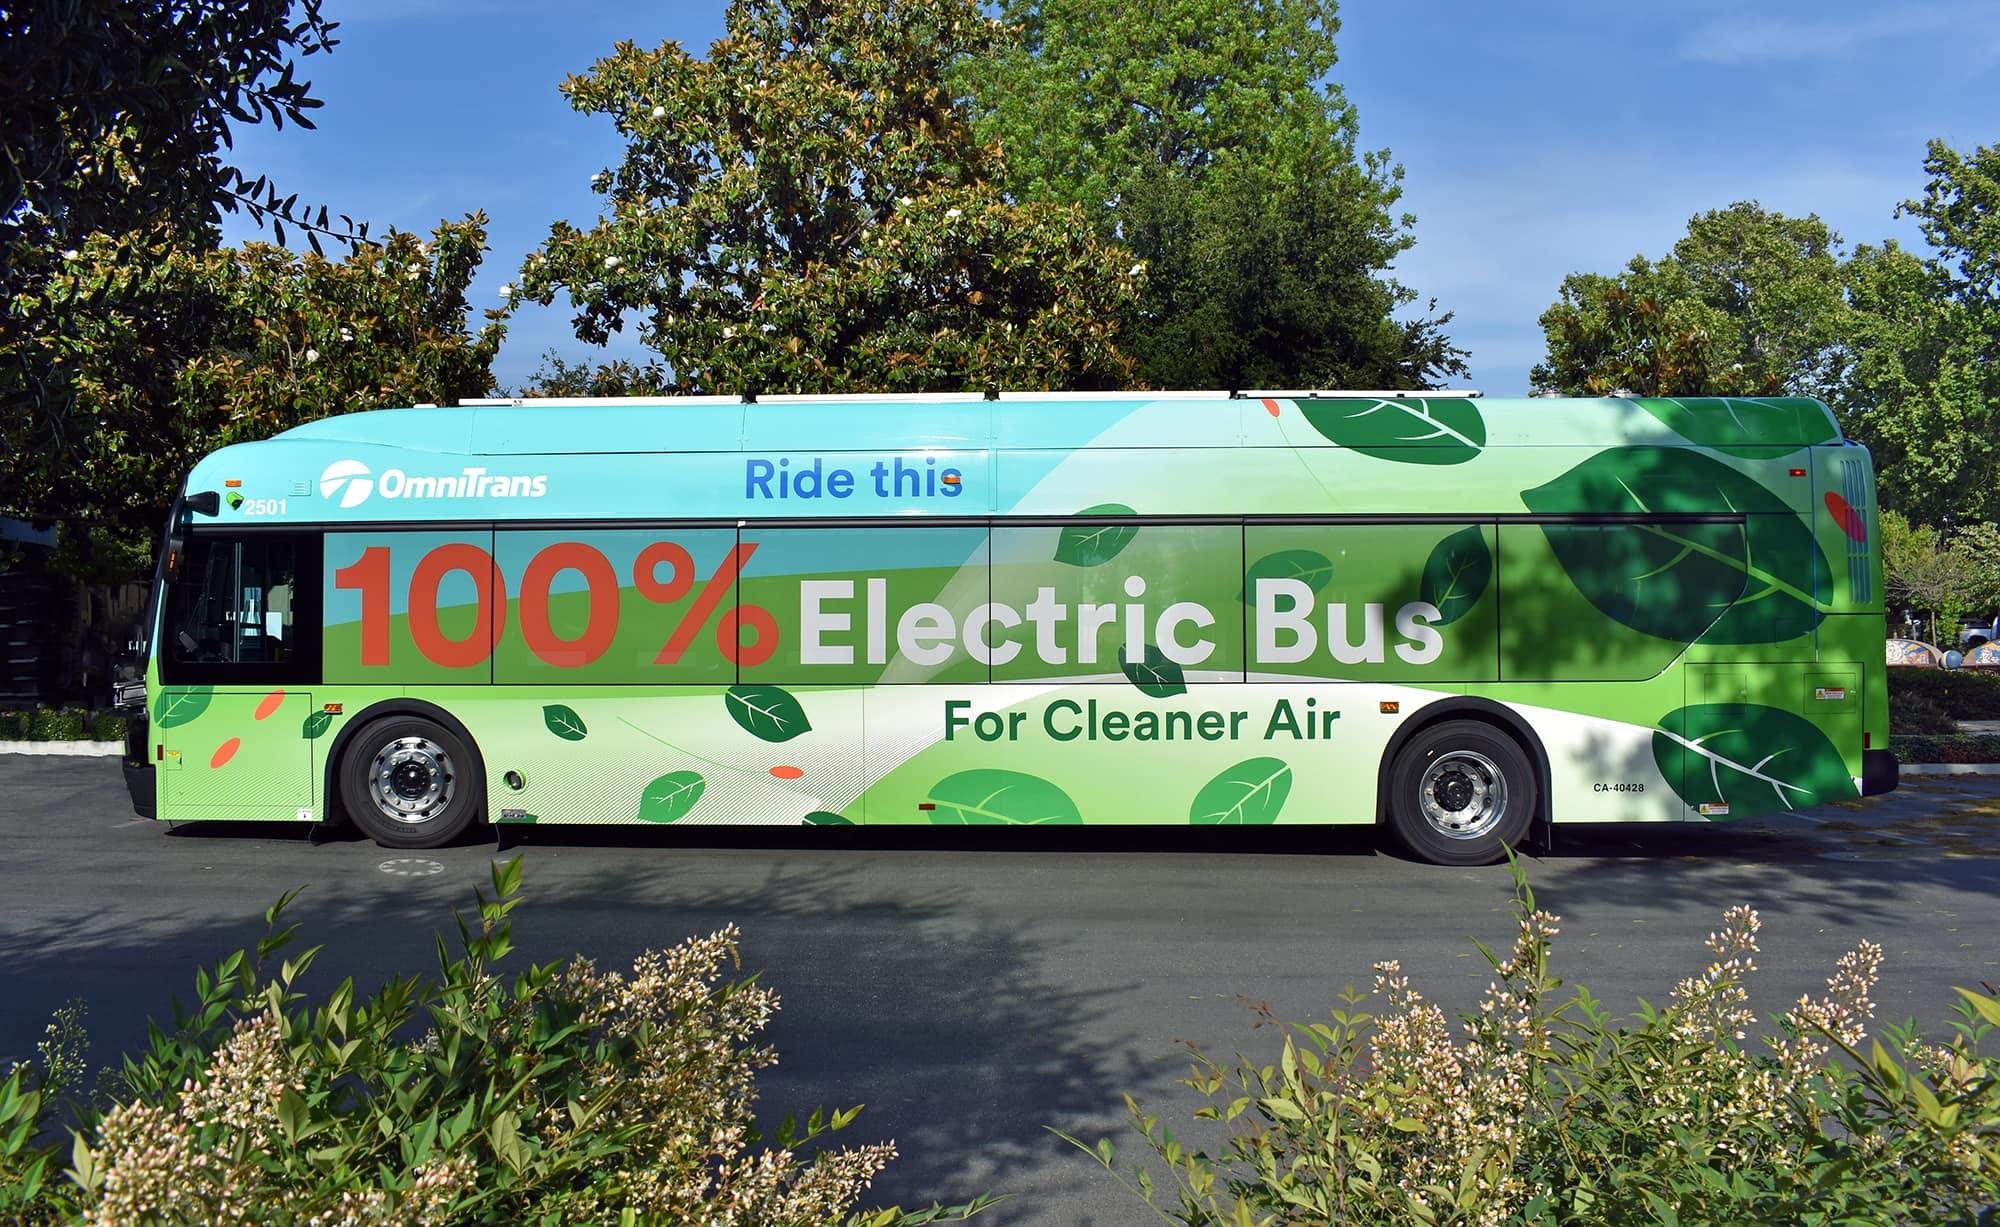 Electric bus image